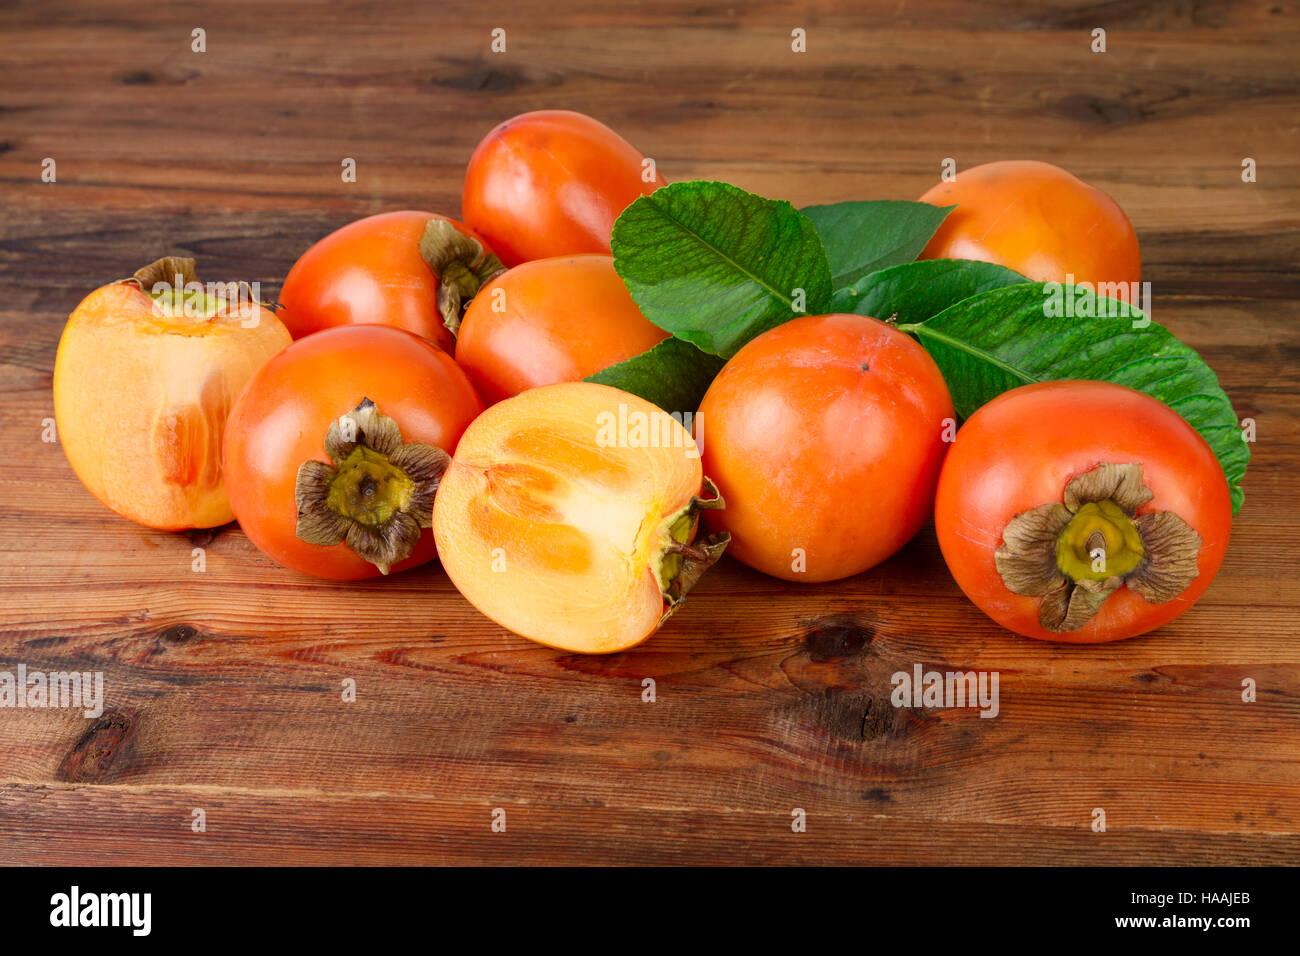 Persimmon. Kaki fruits on old wooden background. - Stock Image